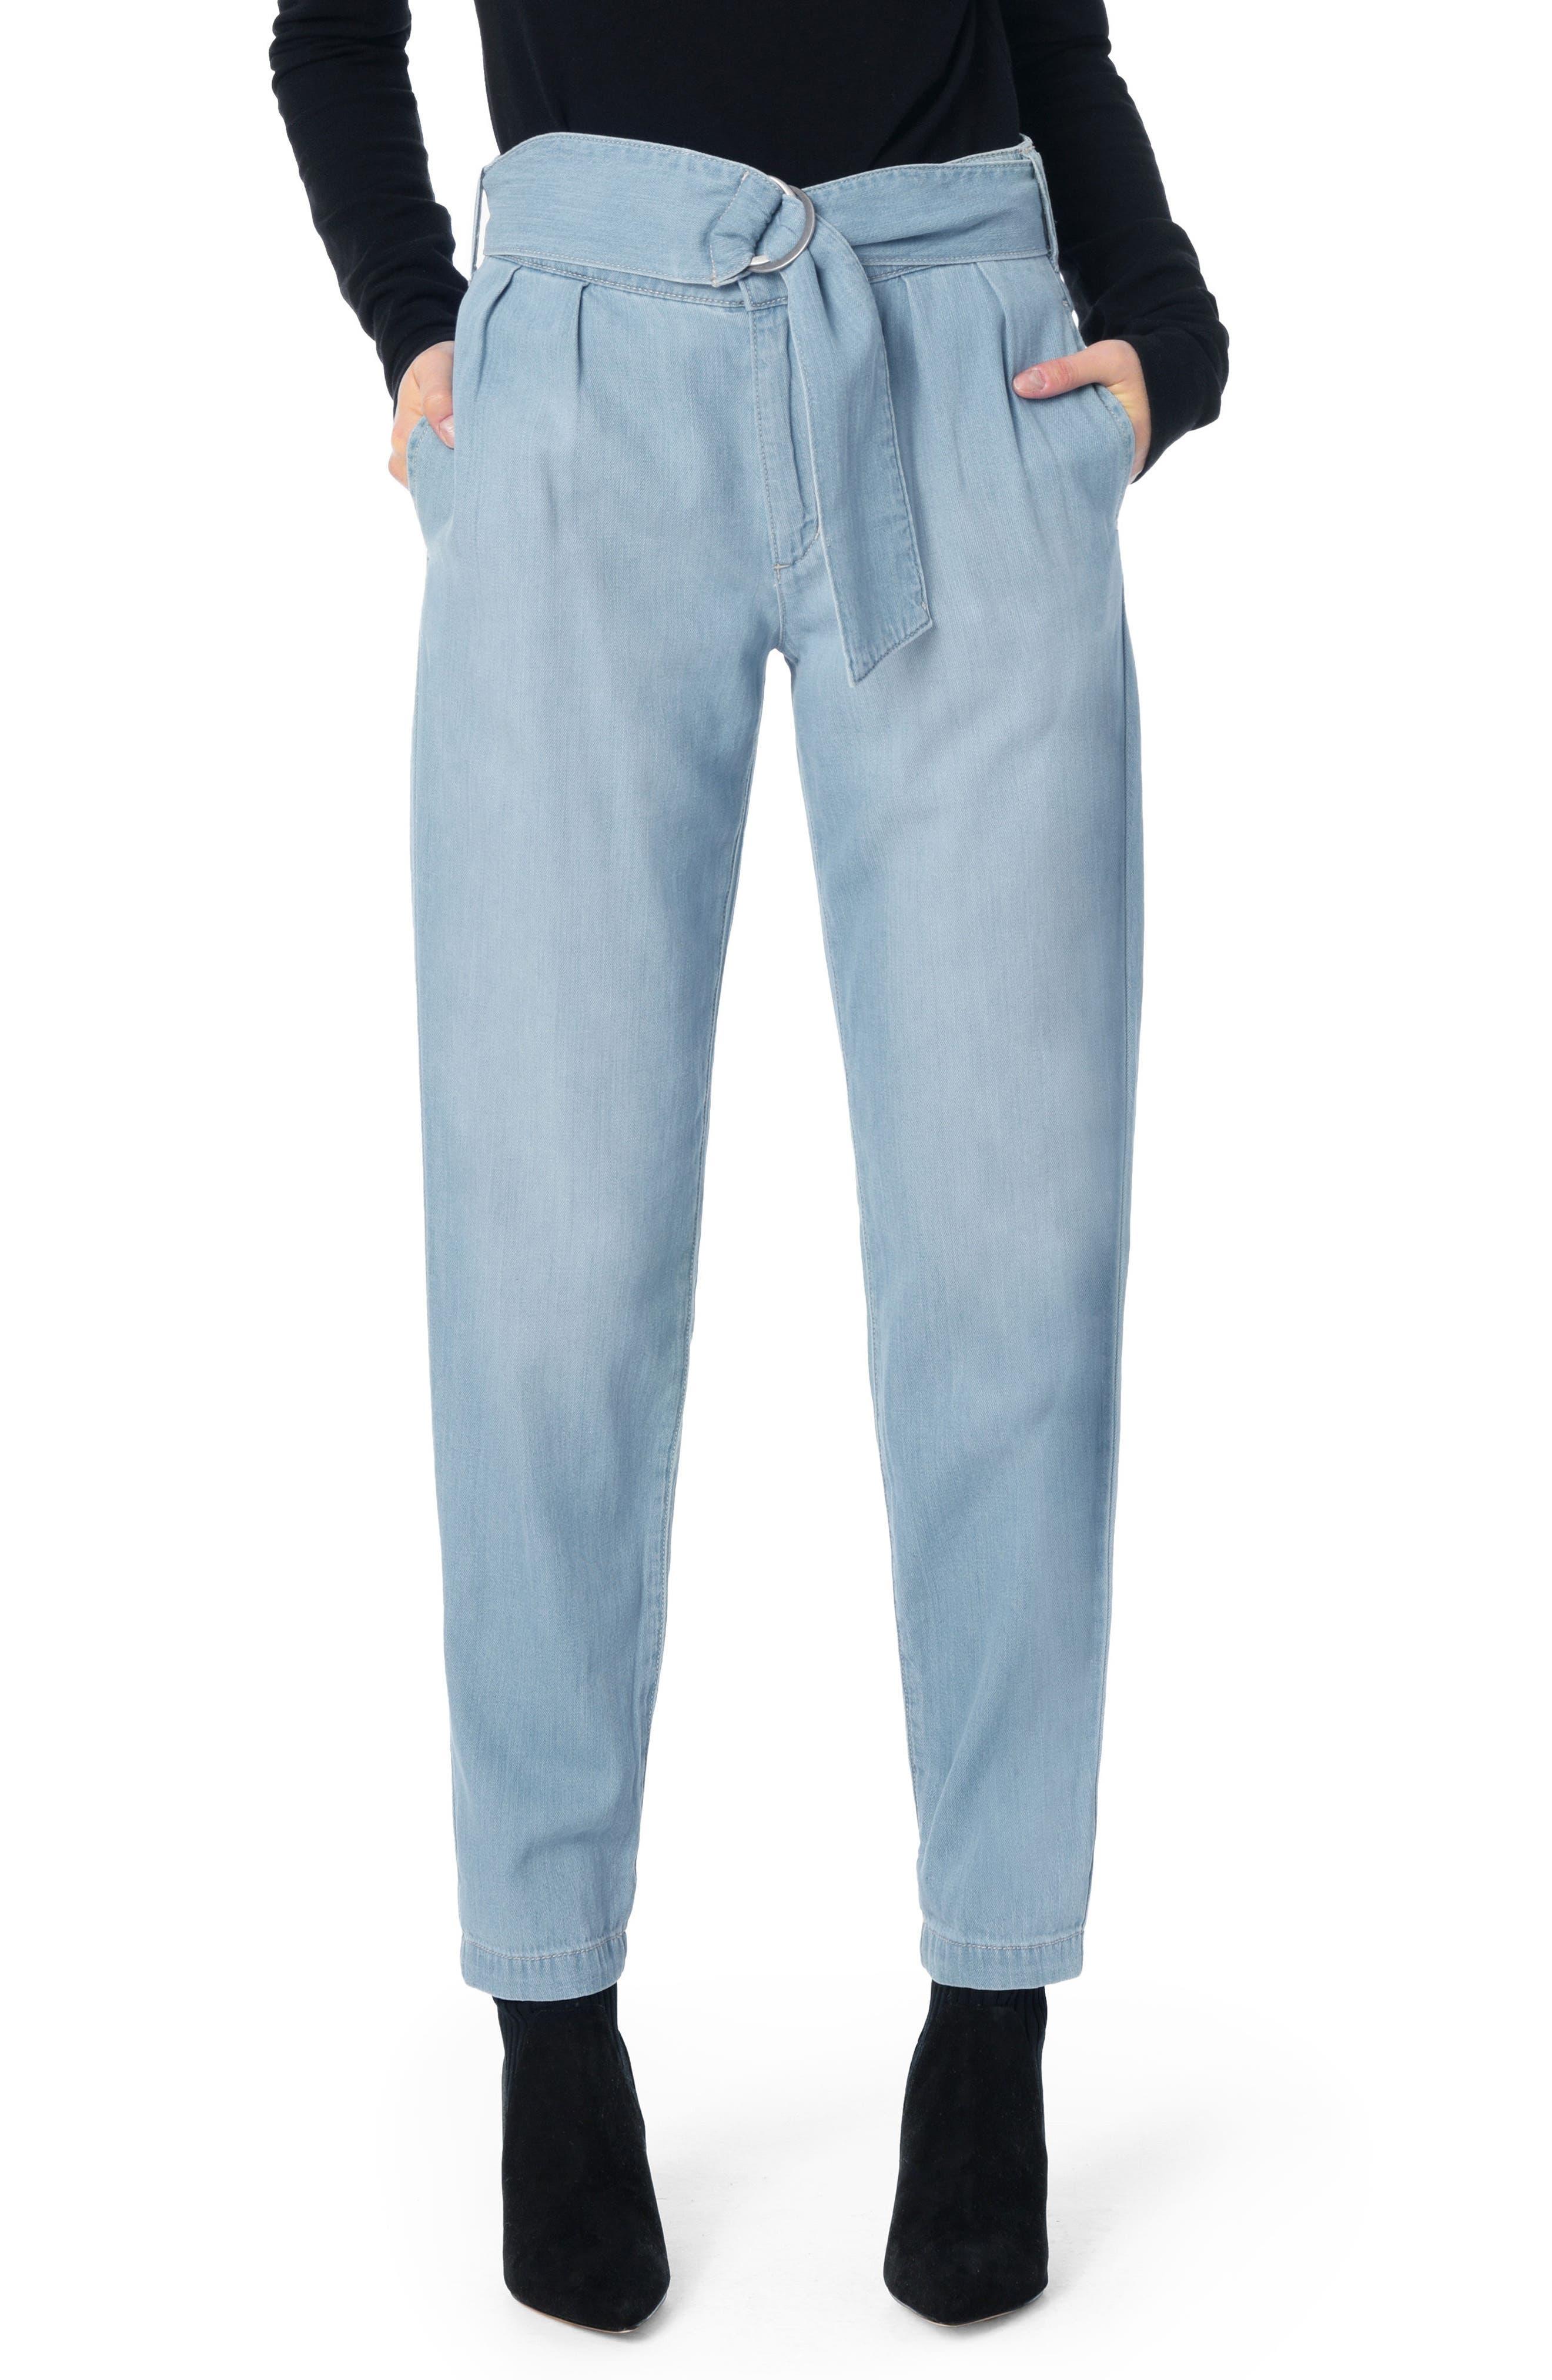 Paperbag Trouser Pants,                             Main thumbnail 1, color,                             MARIANNE